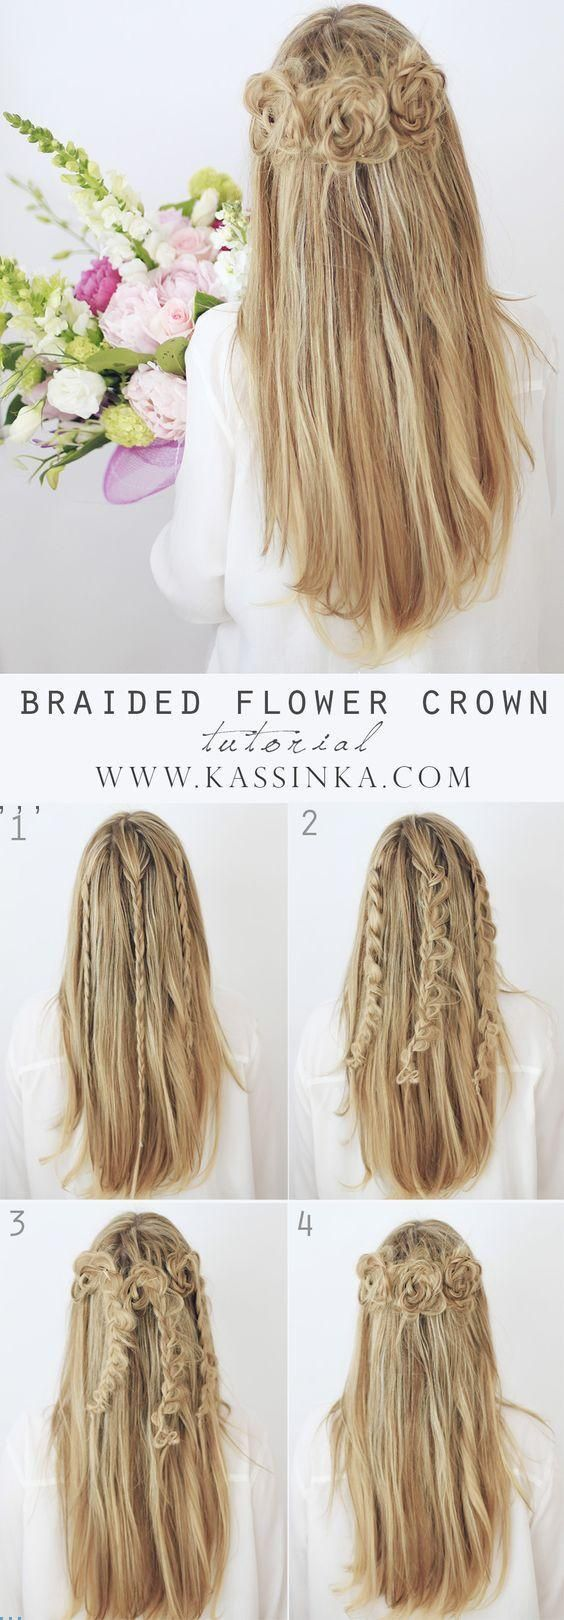 Braided flower crown kassinka beauty nails hair pinterest braided flower crown kassinka braid flowerflower crownsmedium hairstyleseasy izmirmasajfo